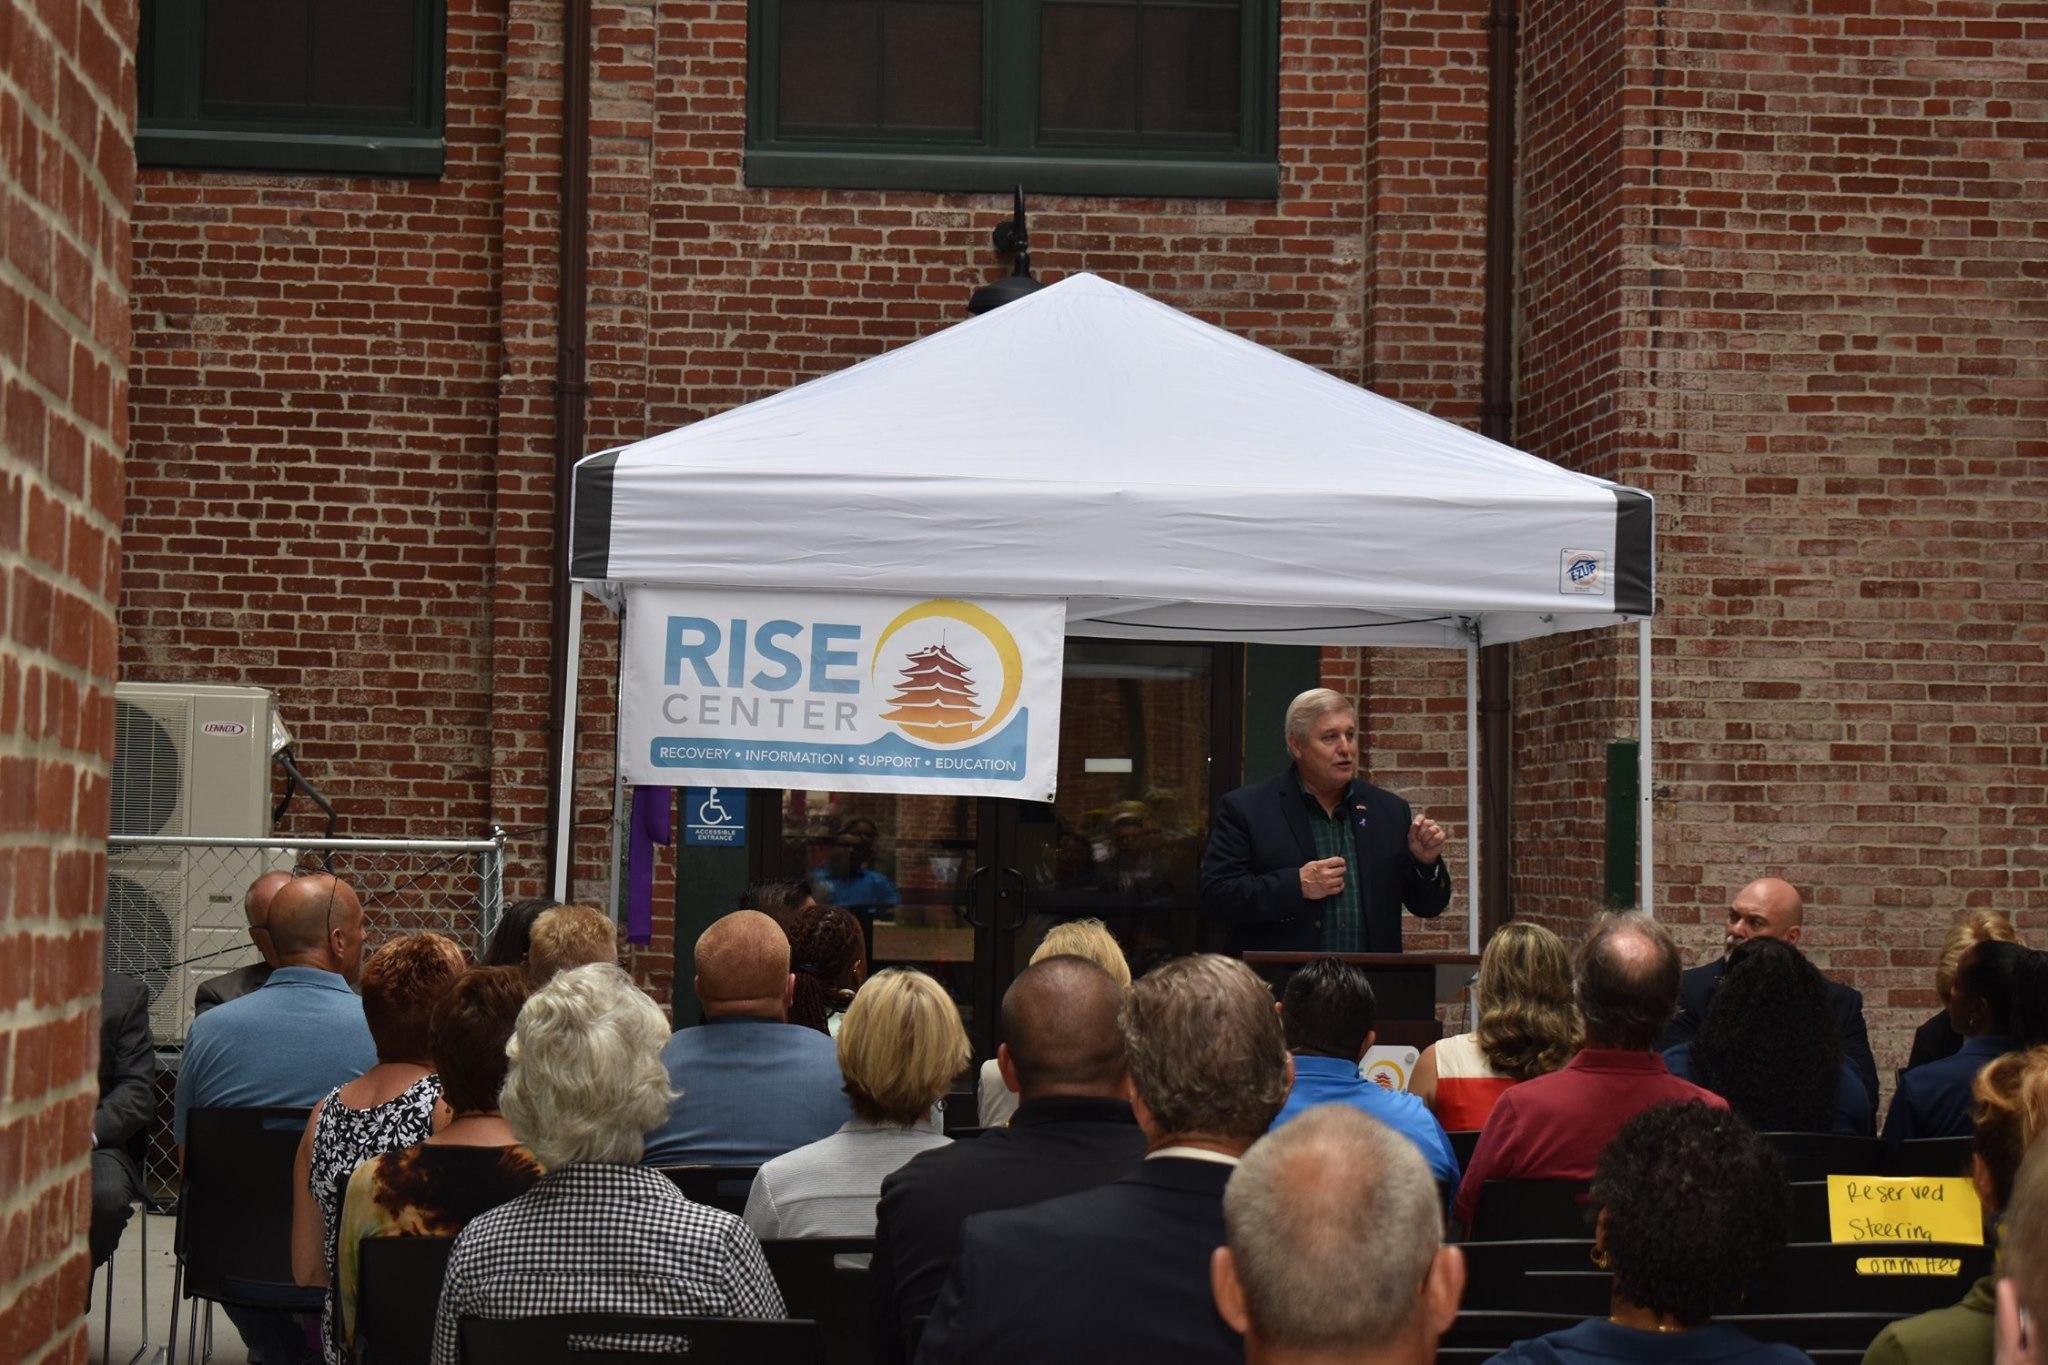 RISE Center